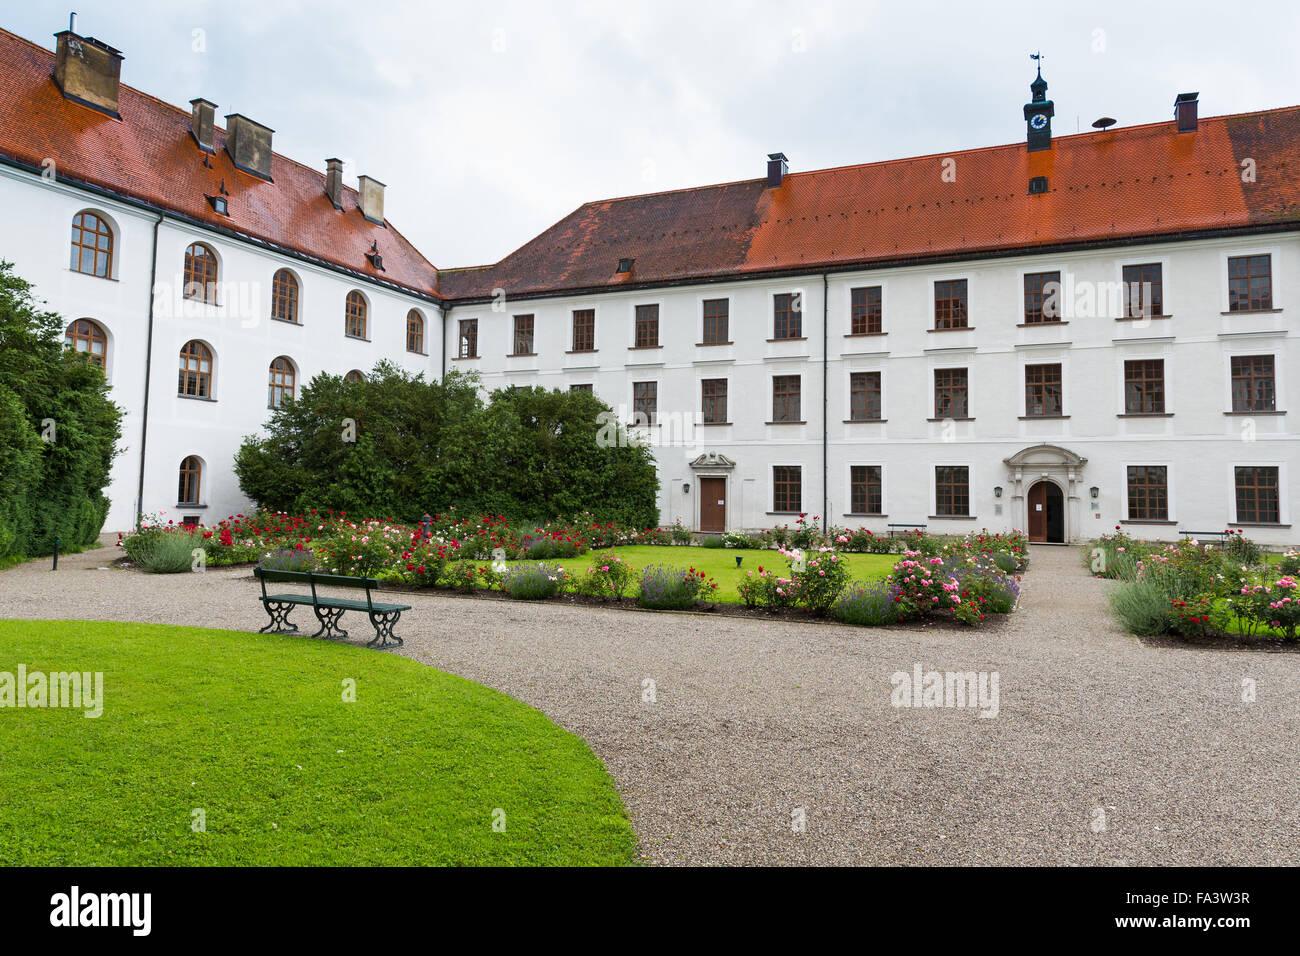 Herreninsel, Chiemsee, Germany, lake, water, boat trip, tourism, travel, island, Schlosshotel Herrenchiemsee - Stock Image